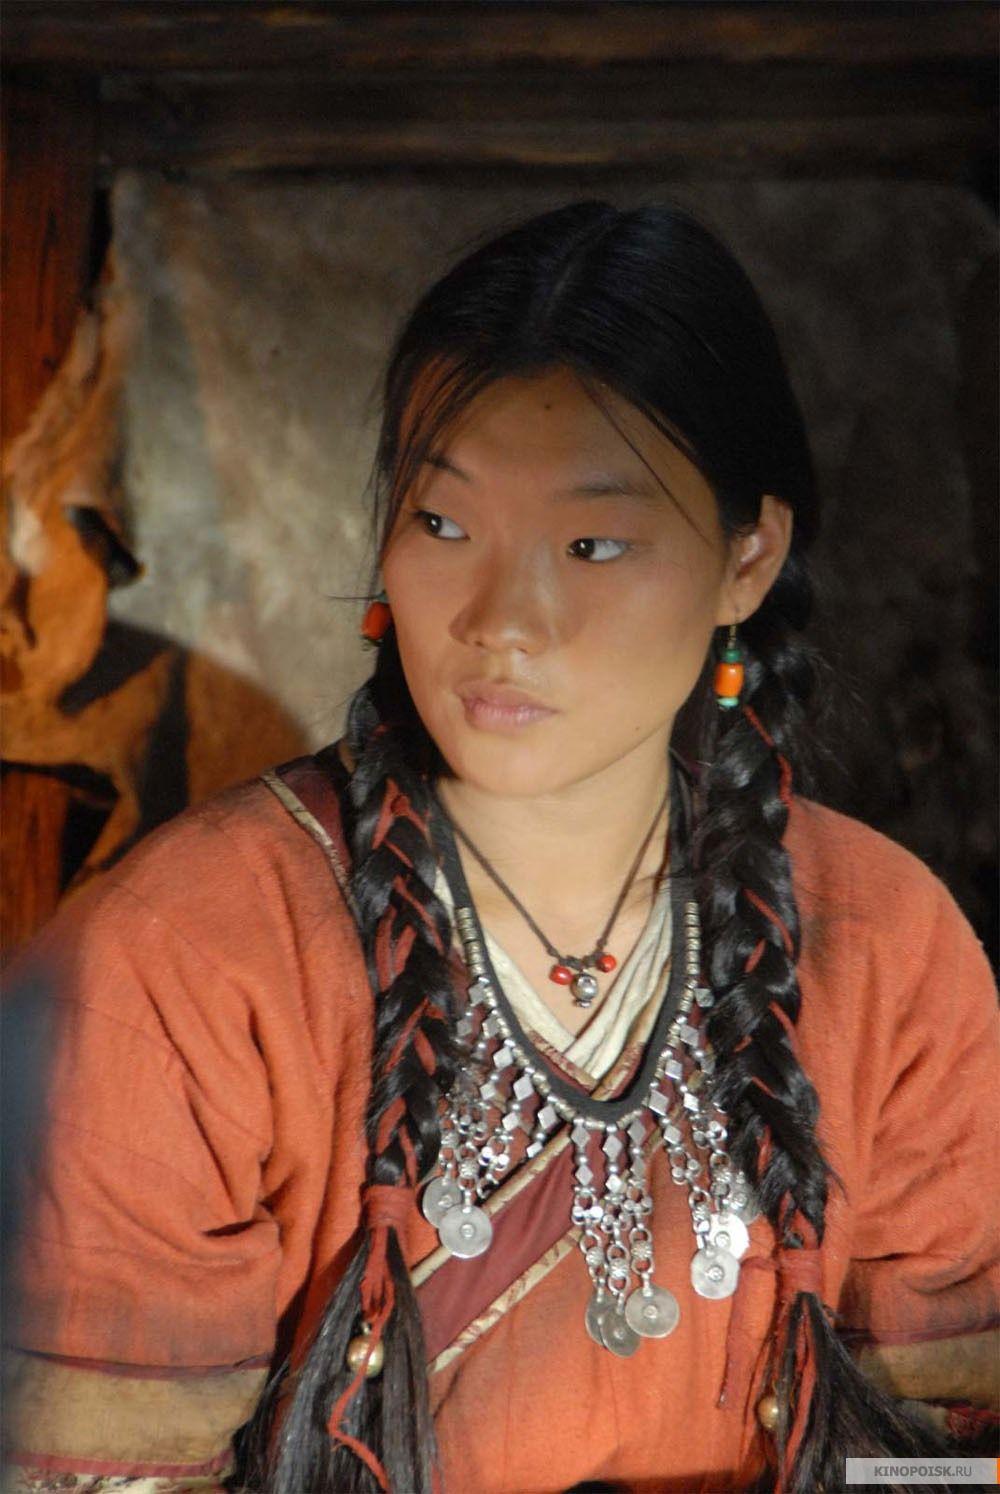 Mongolian Woman  Mongol  Mongolie, Photographie De -8803